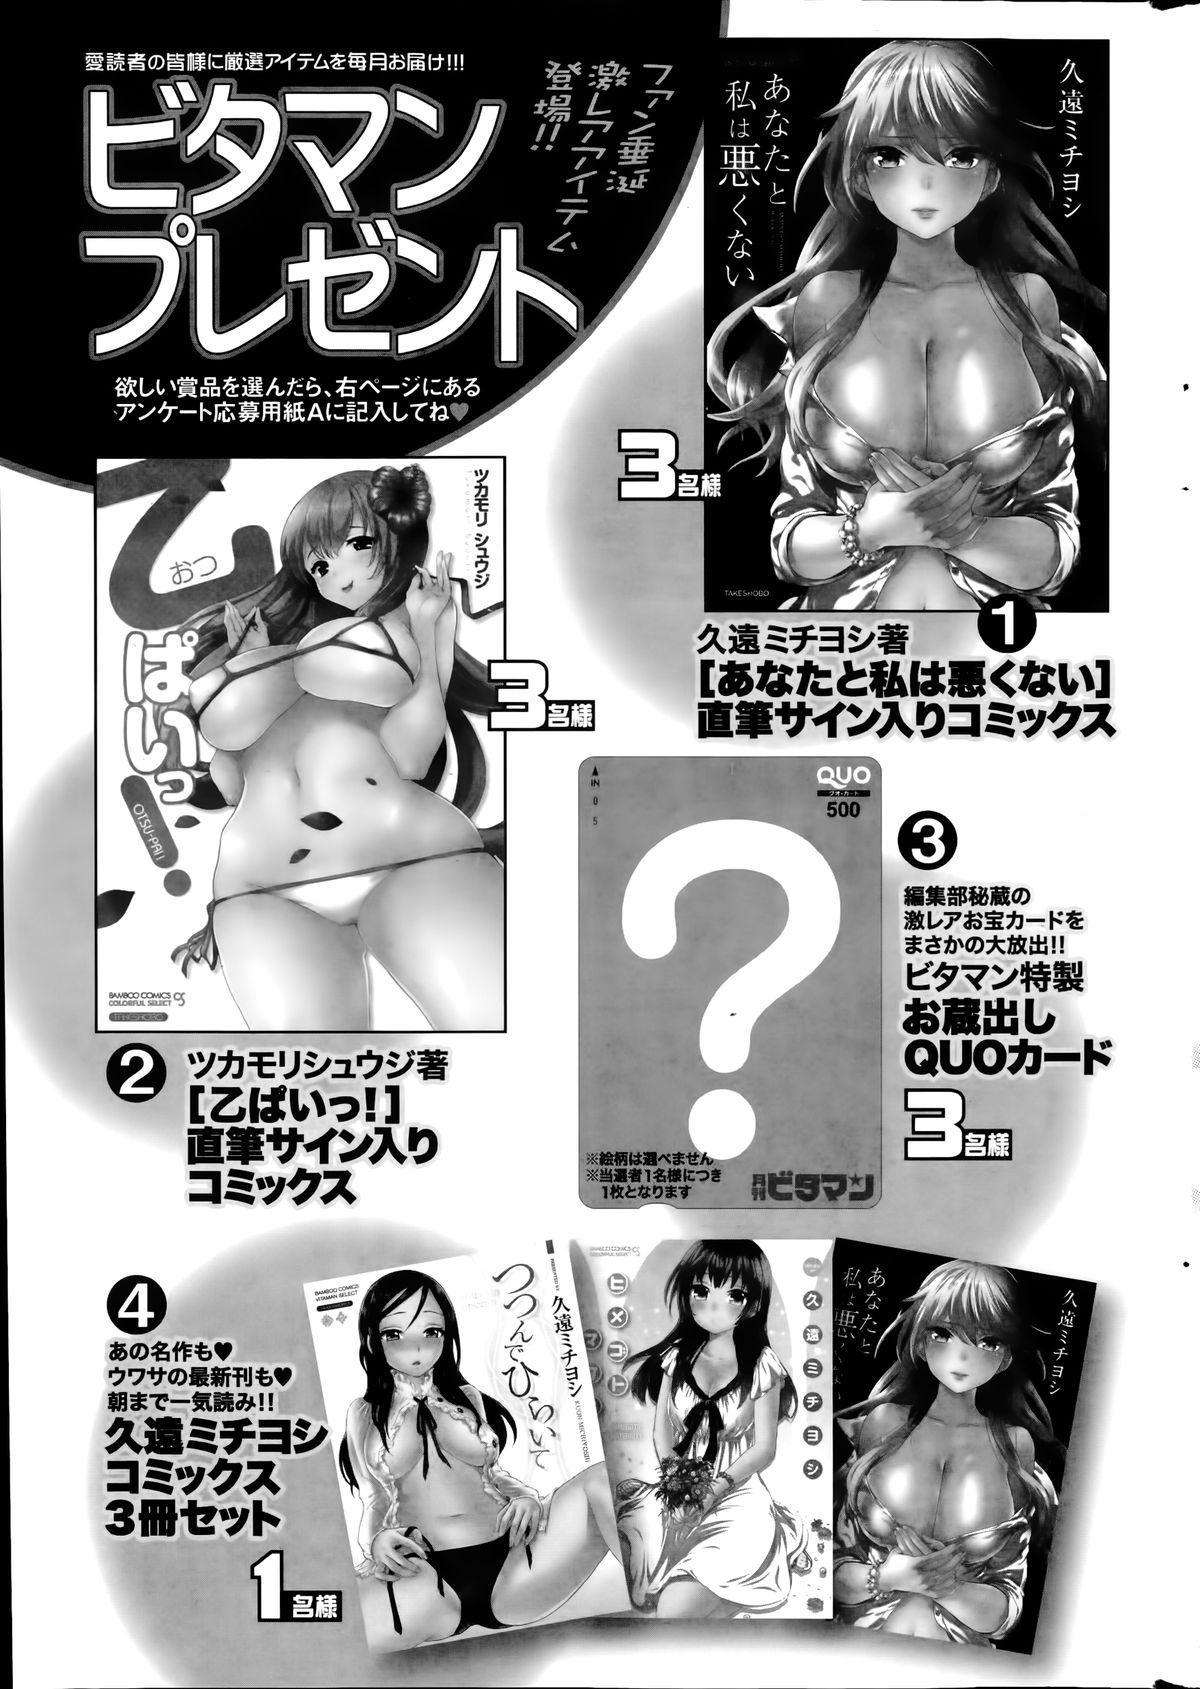 Monthly Vitaman 2014-07 256